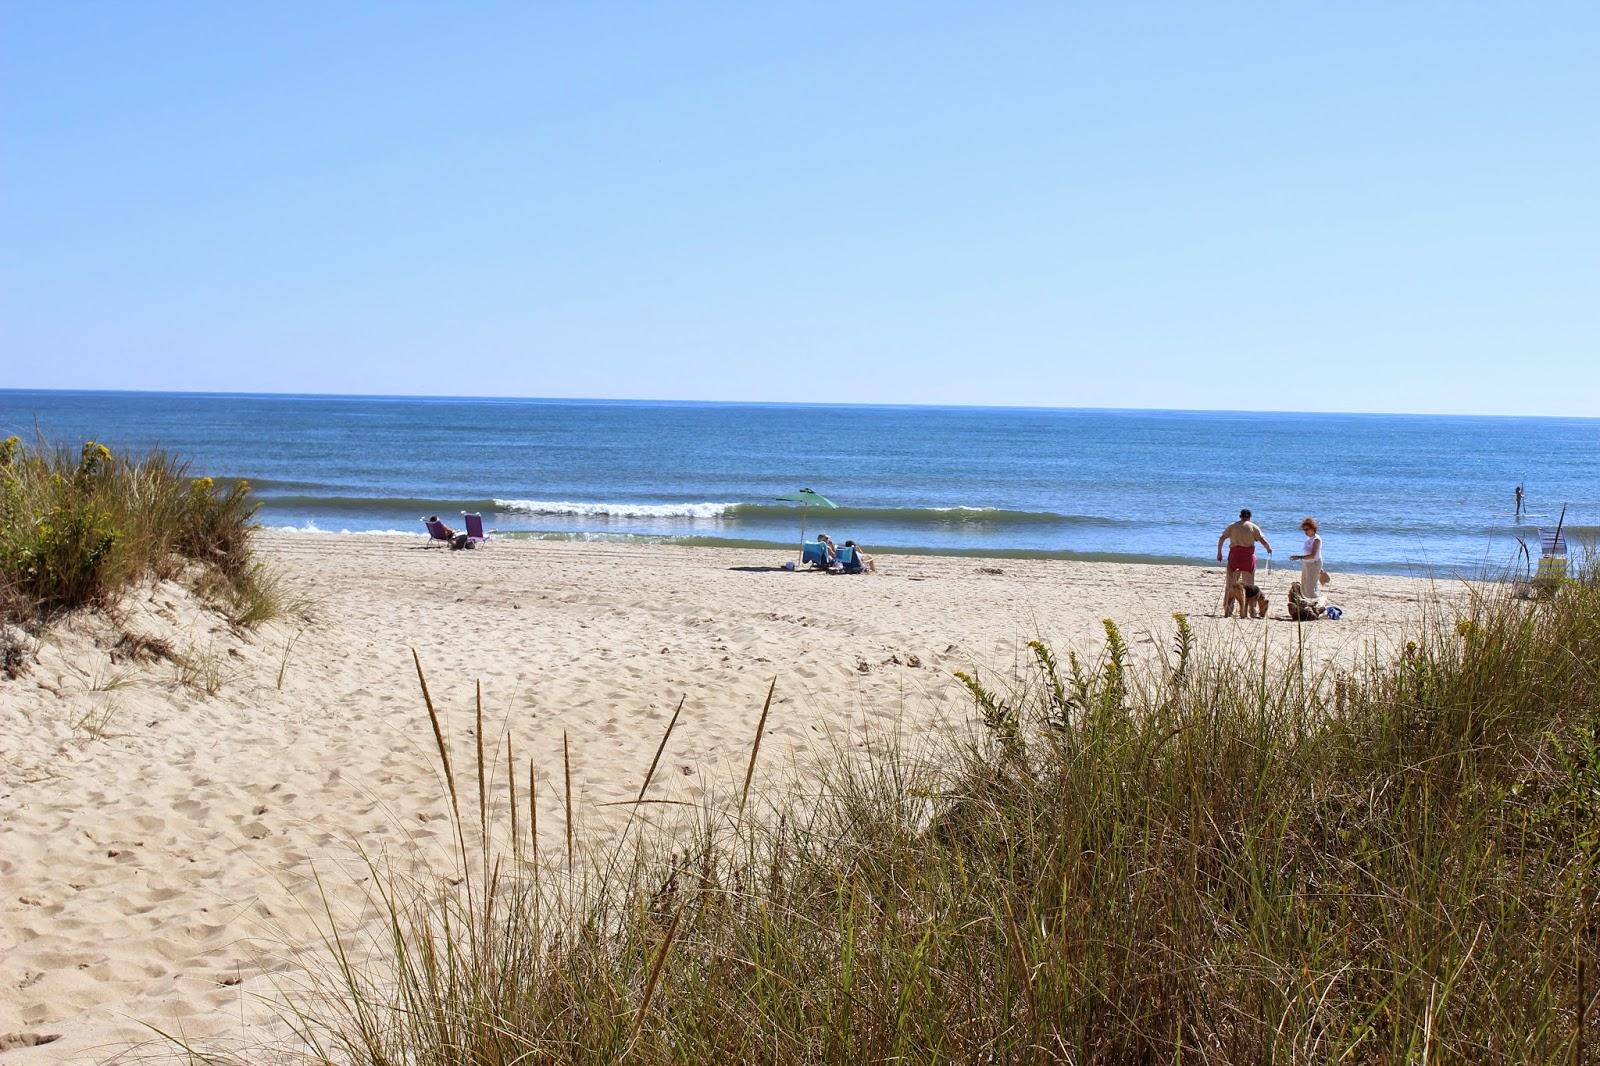 Maidstone Beach